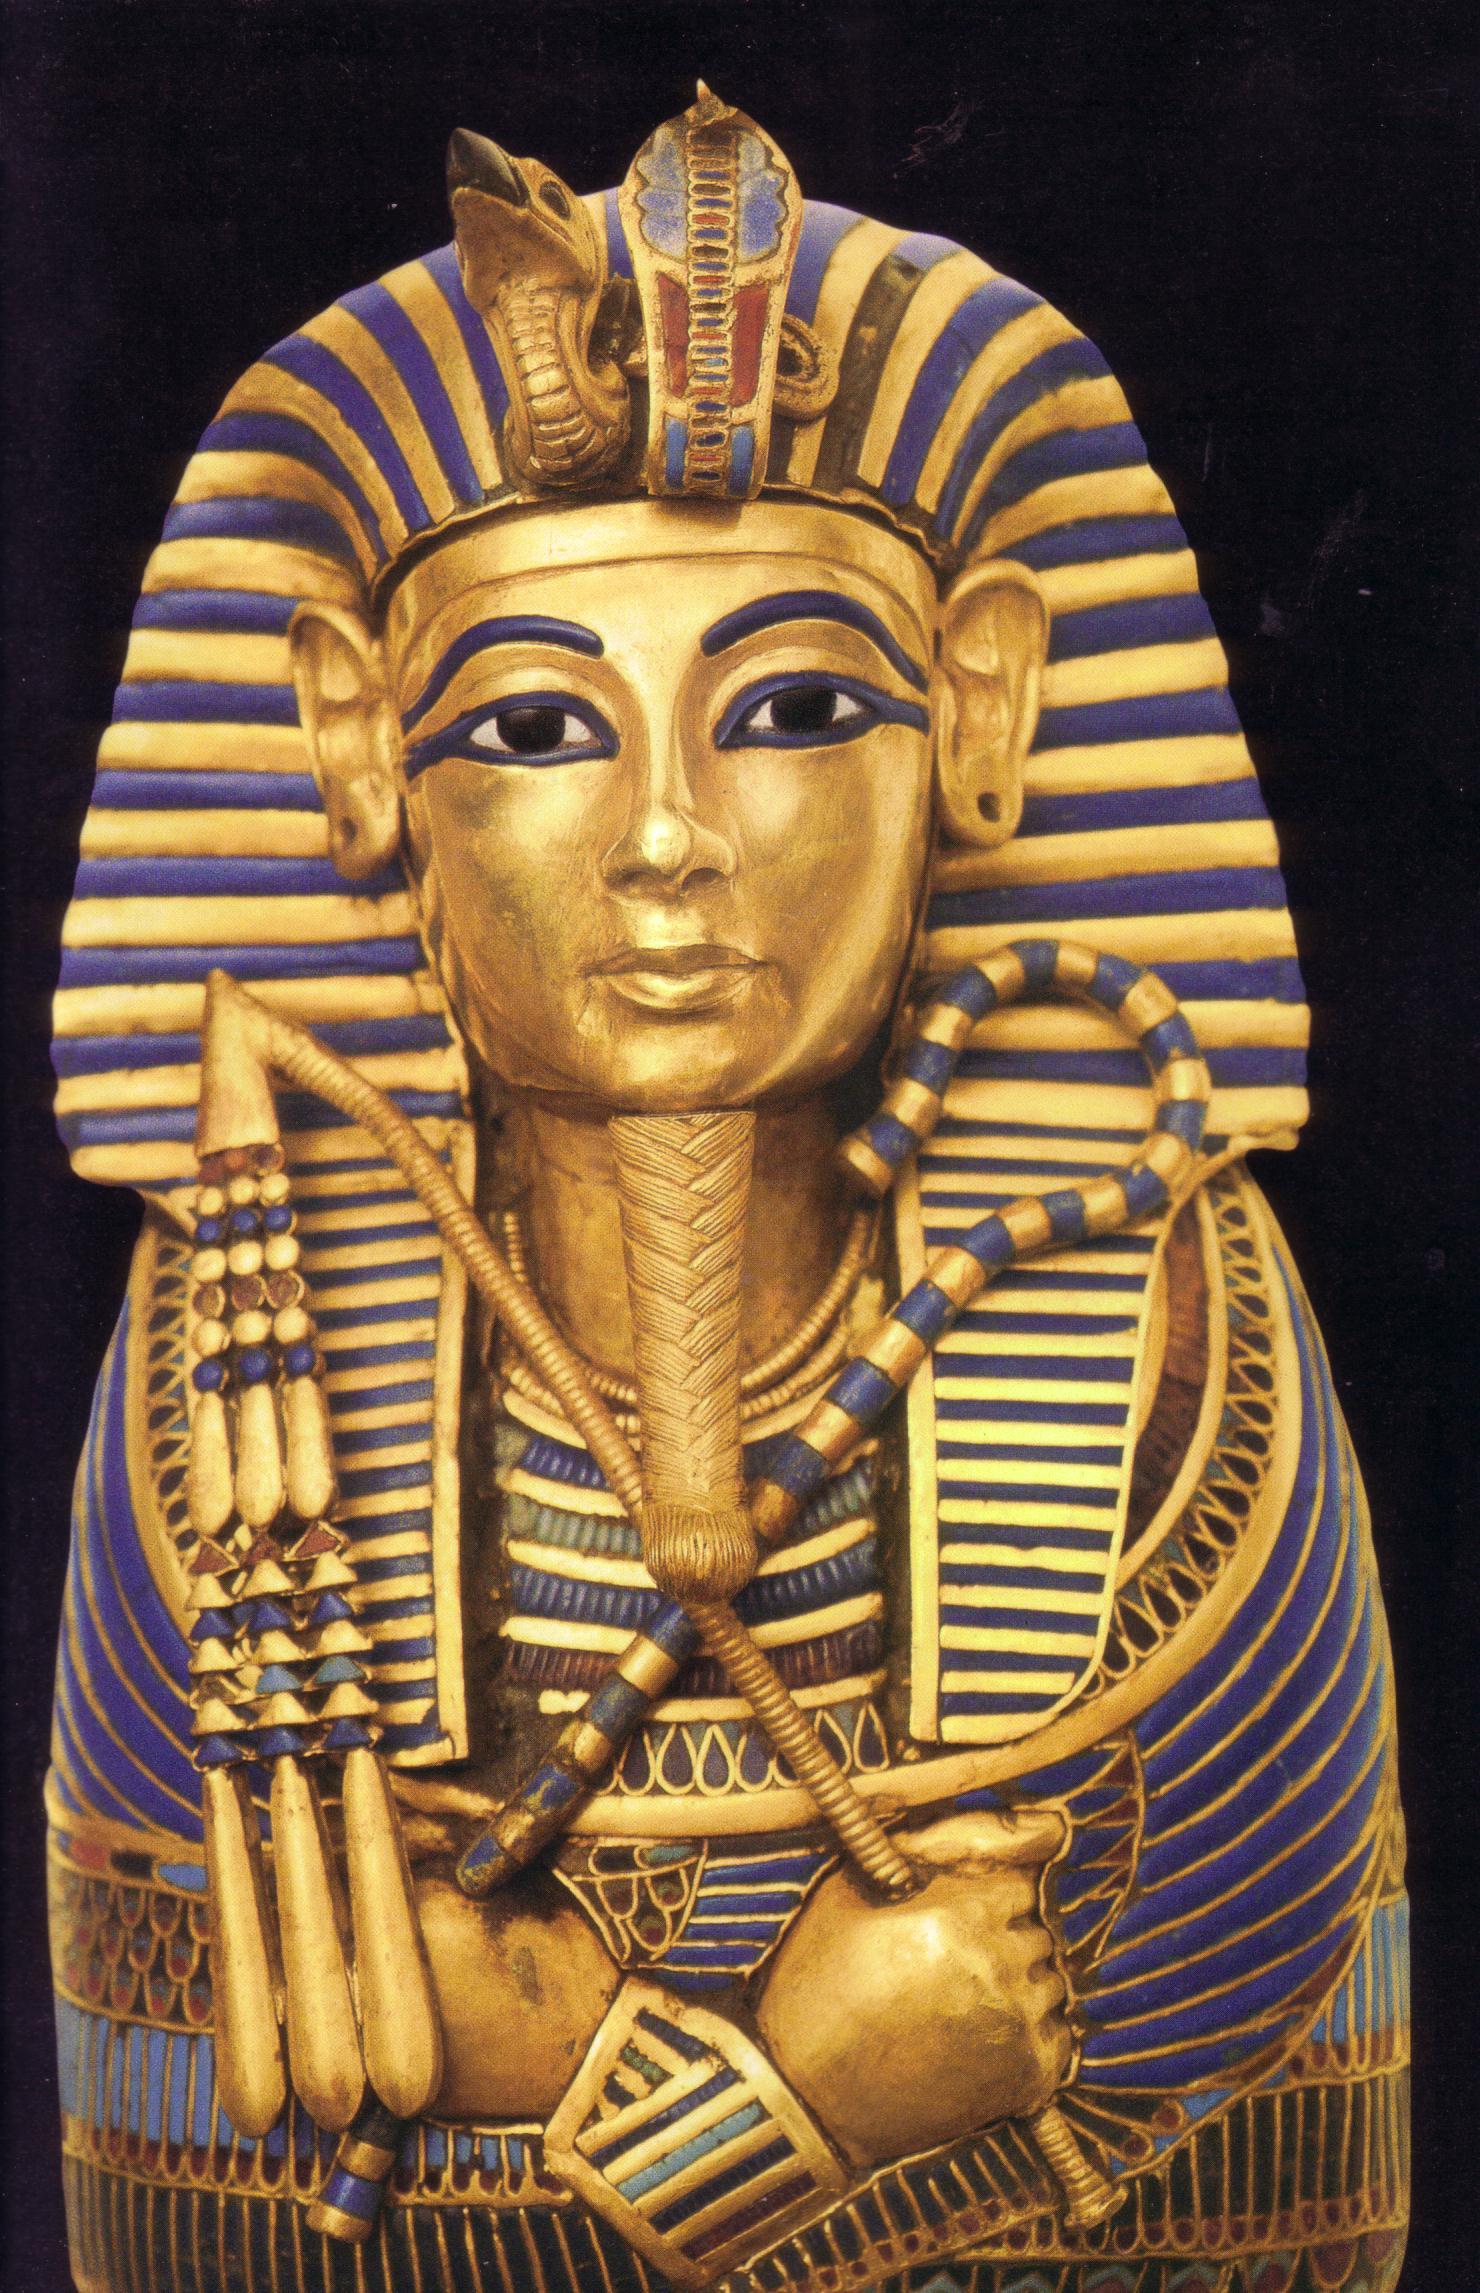 Http Pinstake Com Pharaoh Egyptian King